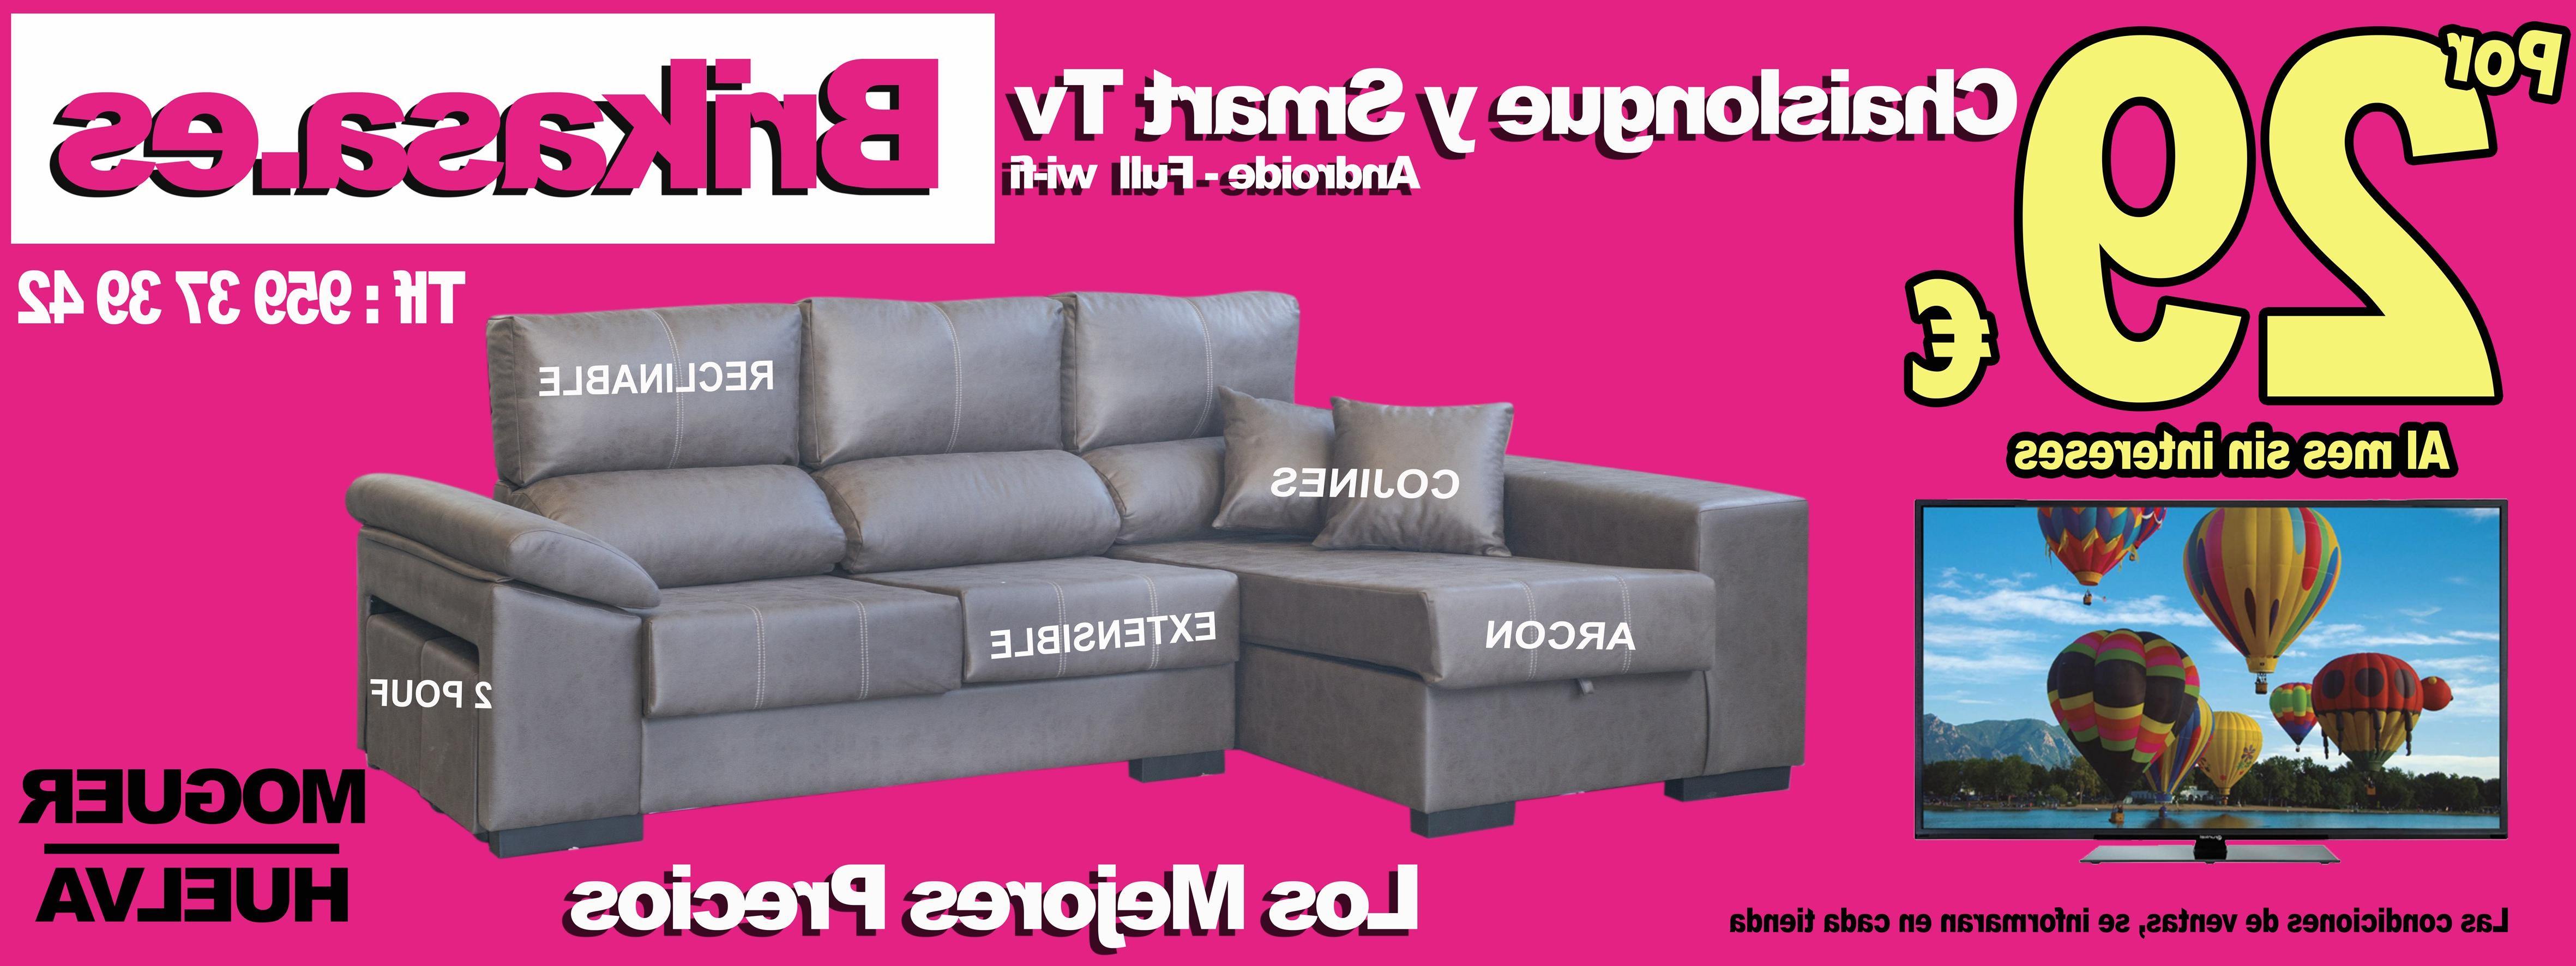 Sofas Baratos Granada 87dx Muebles Usados Huelva sofas Baratos En Granada Good sofs with